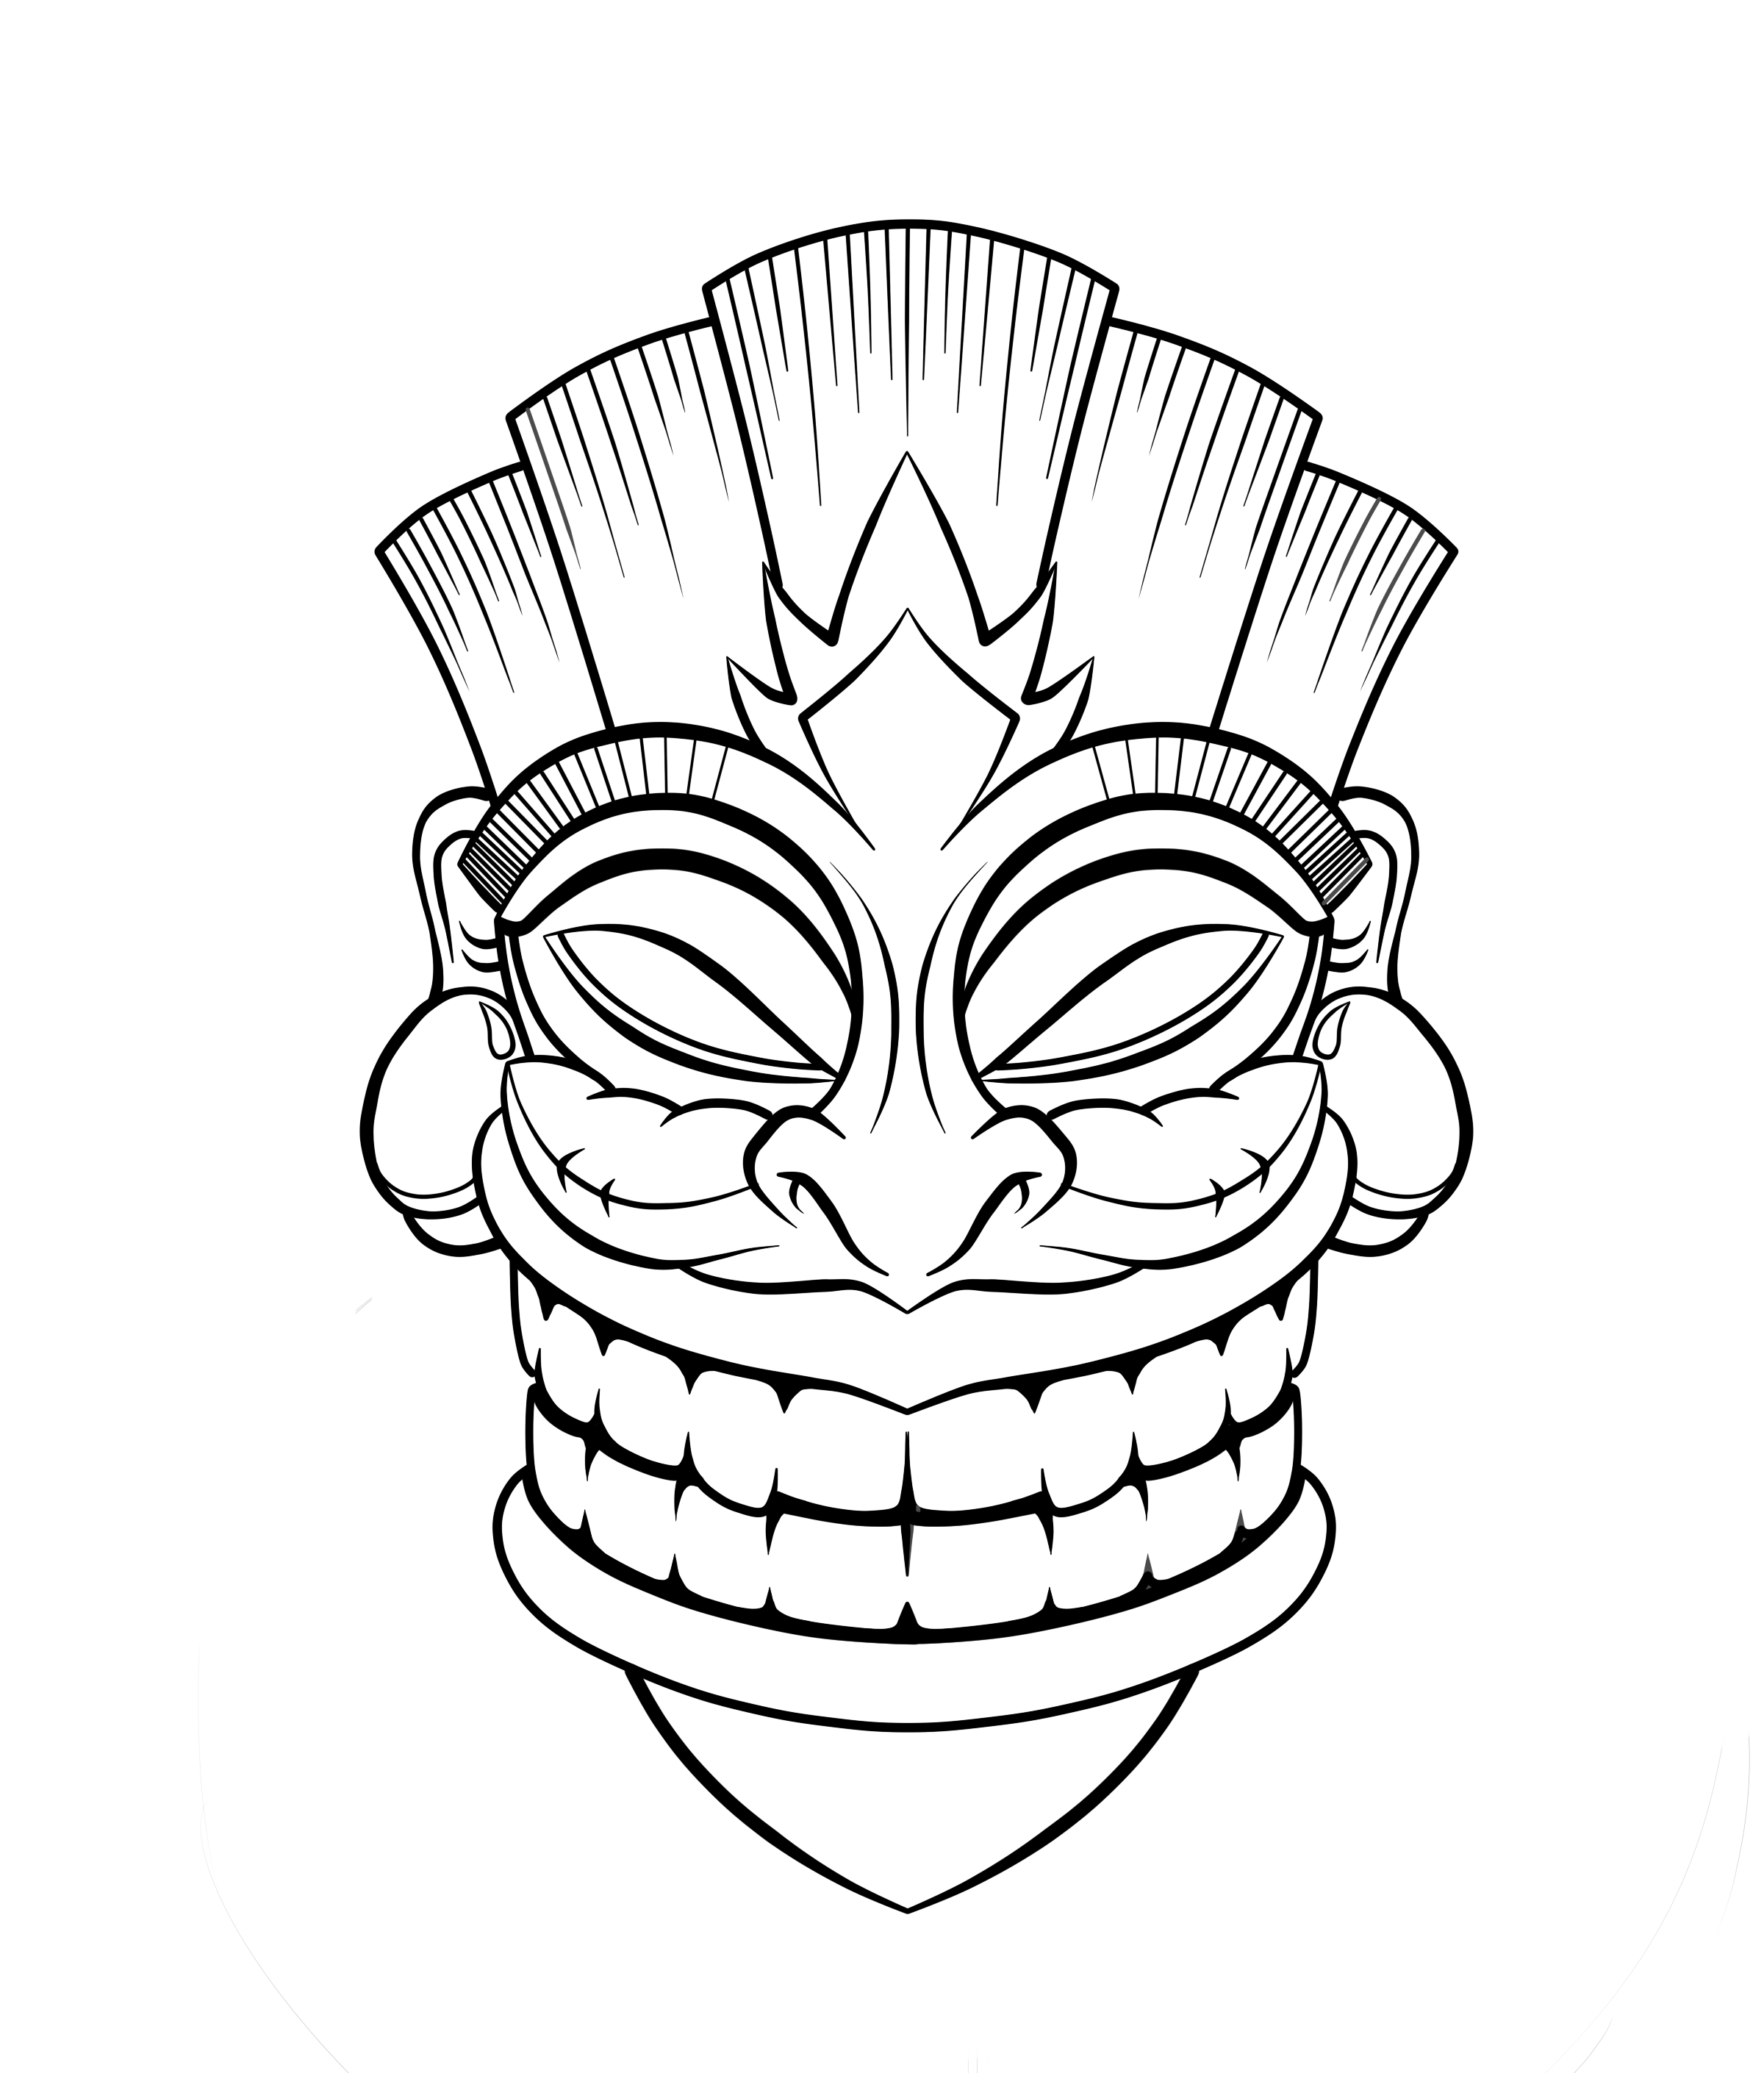 Tiki totem faces black and white clipart clipart royalty free Tiki Hut Clipart Cliparts Co | Tiki Time | Tiki tattoo, Tiki ... clipart royalty free